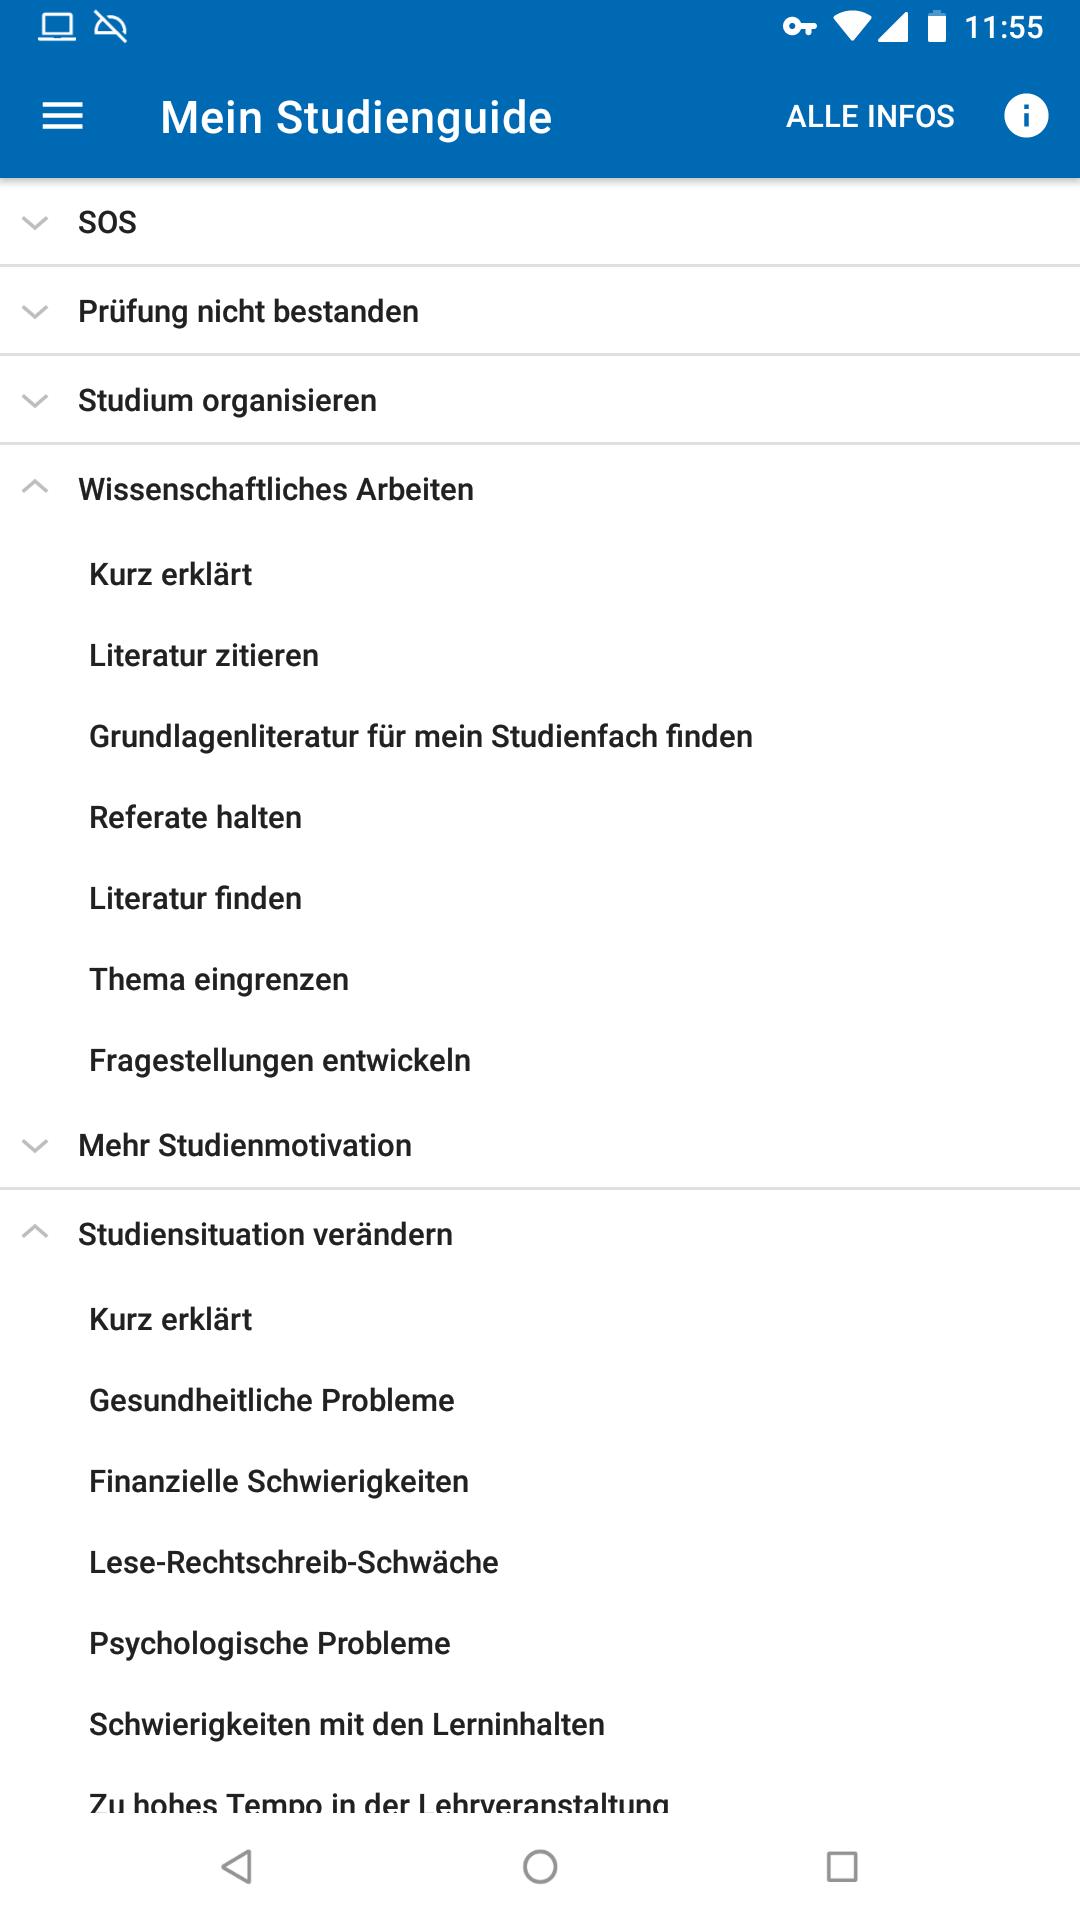 HSMWmobil: Mein Studienguide (1)